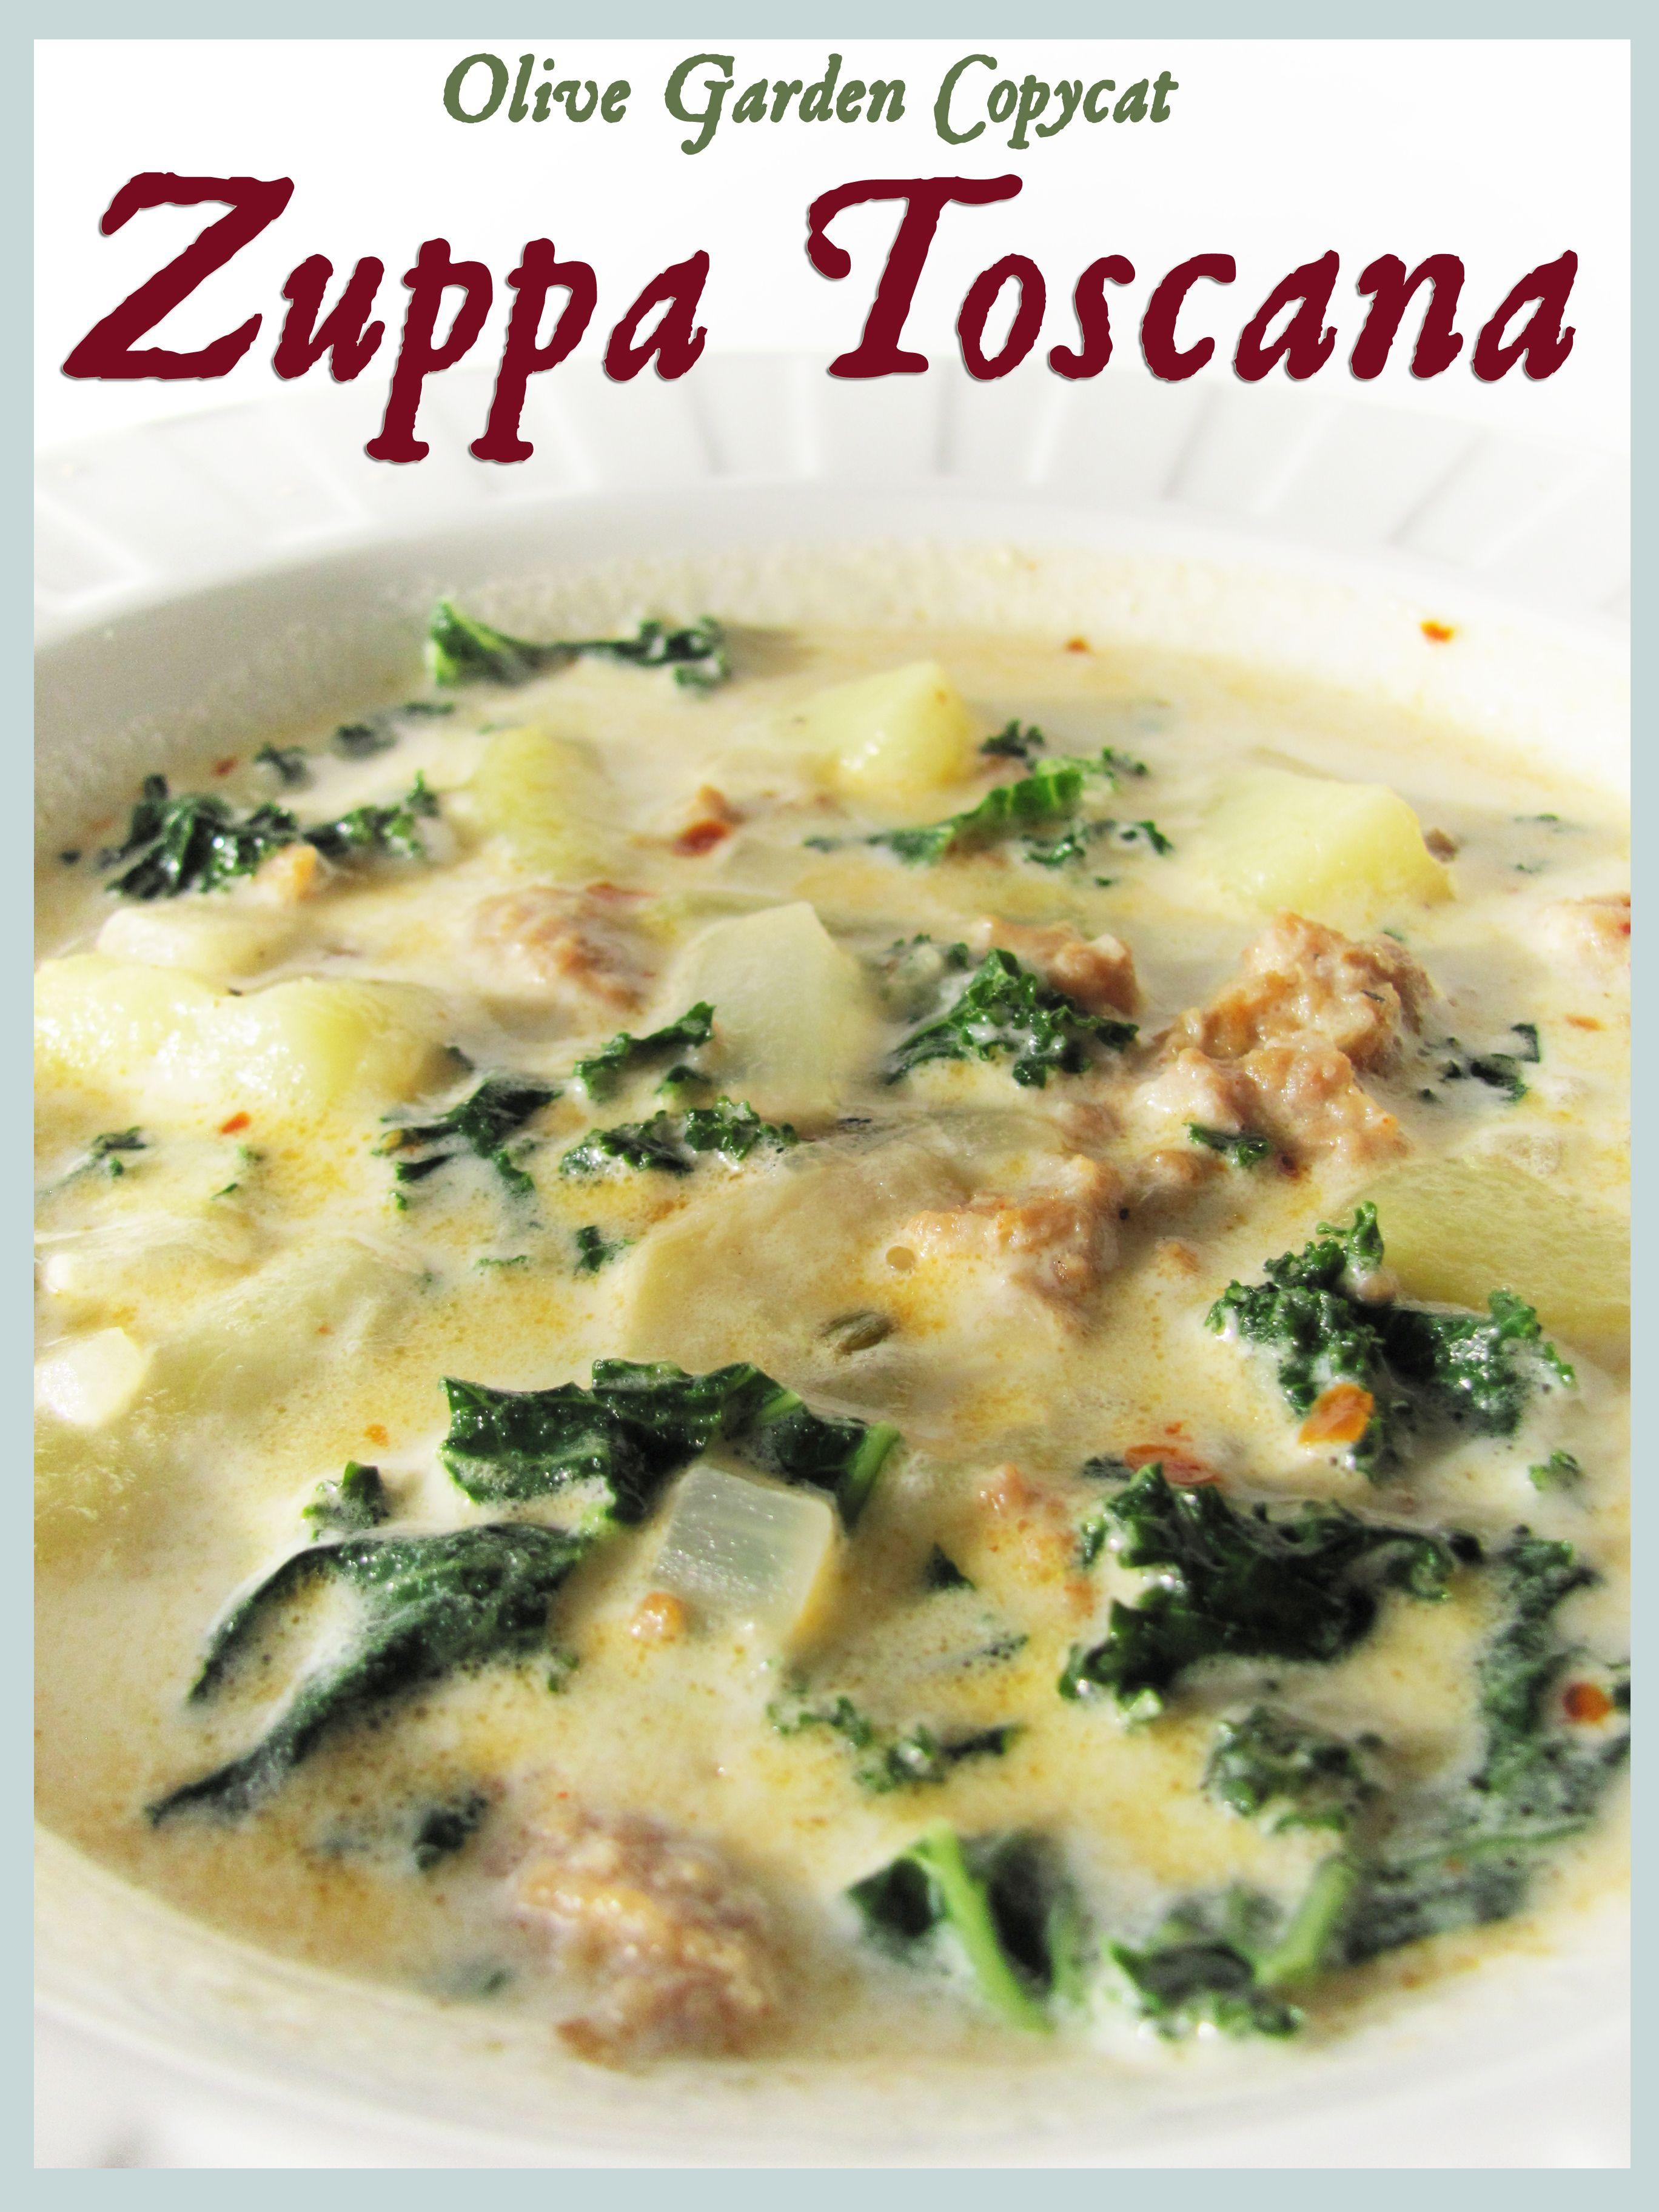 Olive Garden Copycat Zuppa Toscana Recipe Zuppa Toscana Zuppa Toscana Olive Garden And